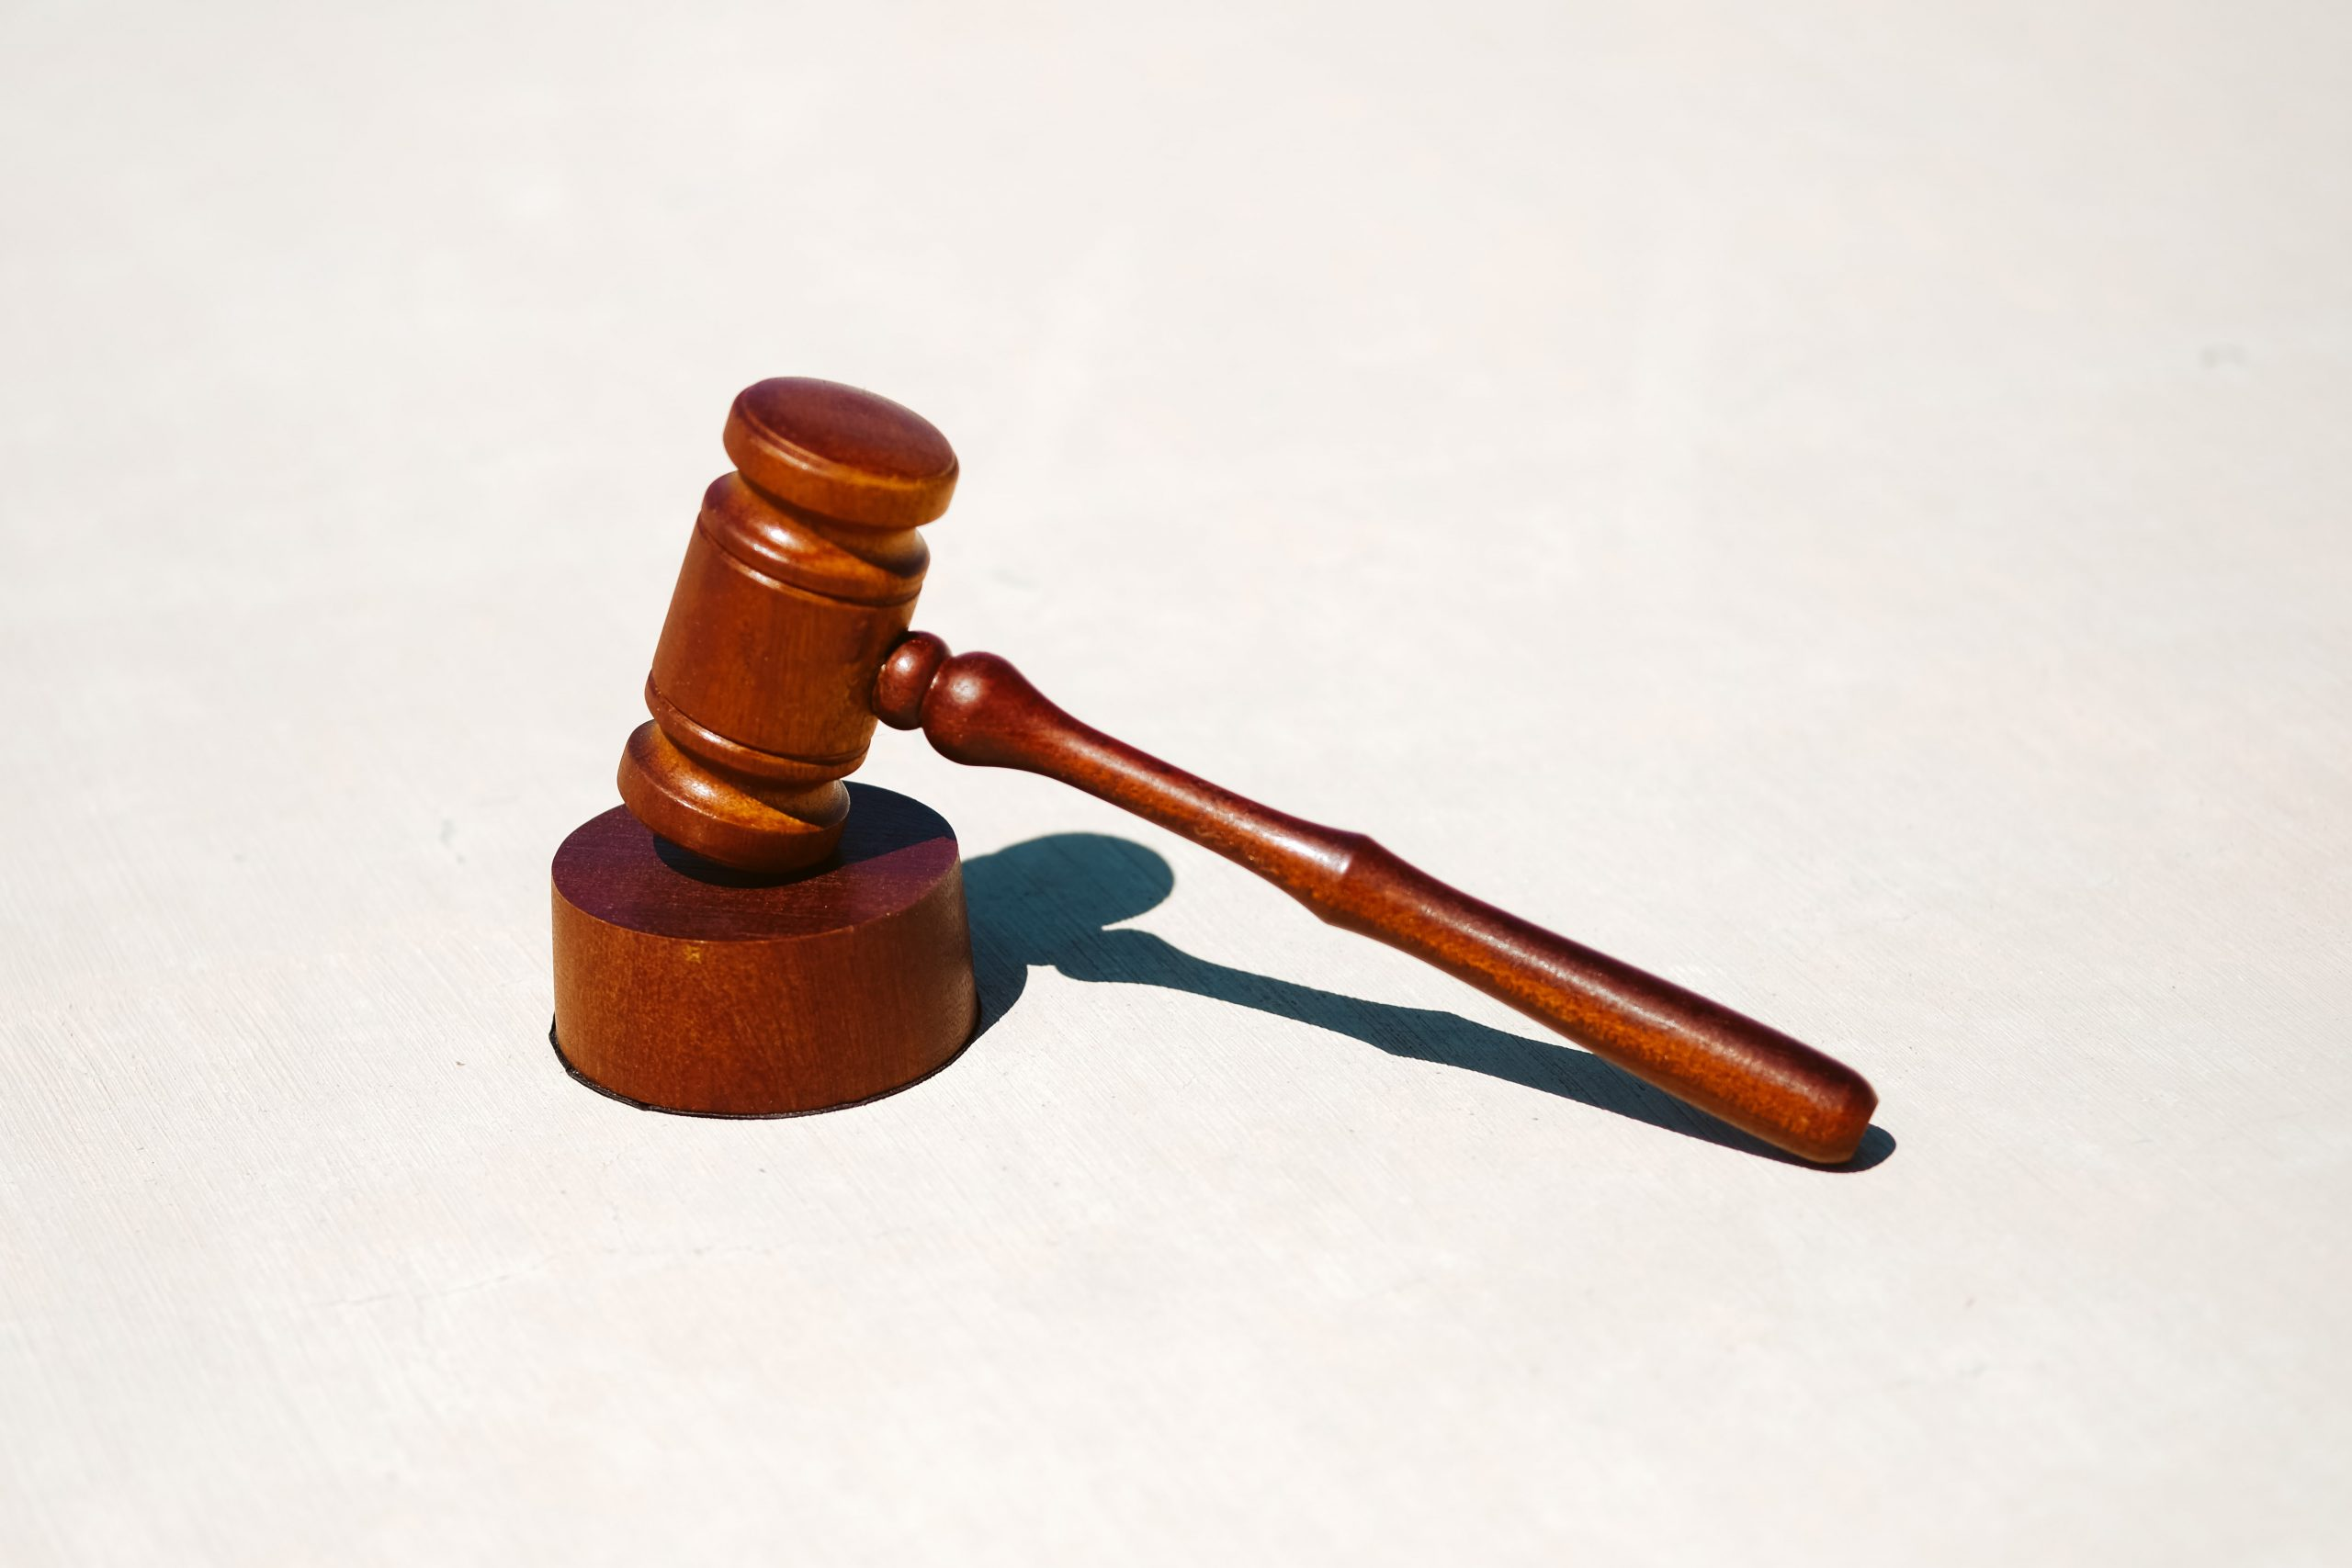 curiosities about romanian judges